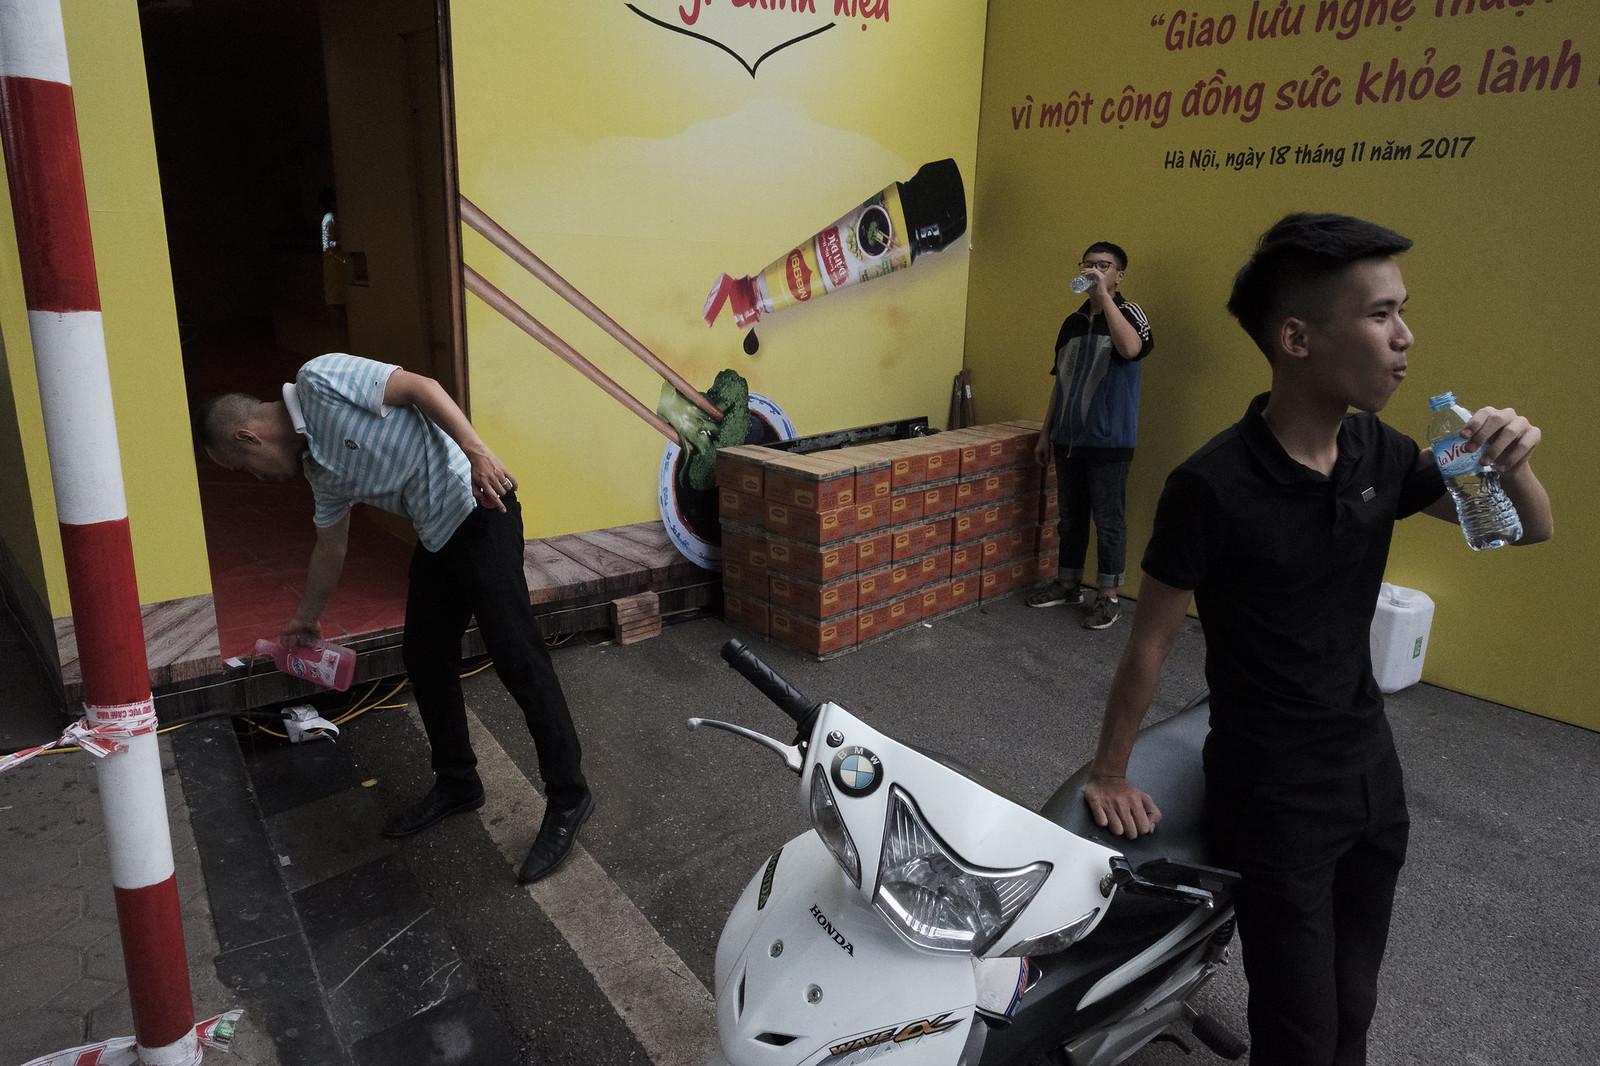 Hanoi 2017 | by chrjs.0510